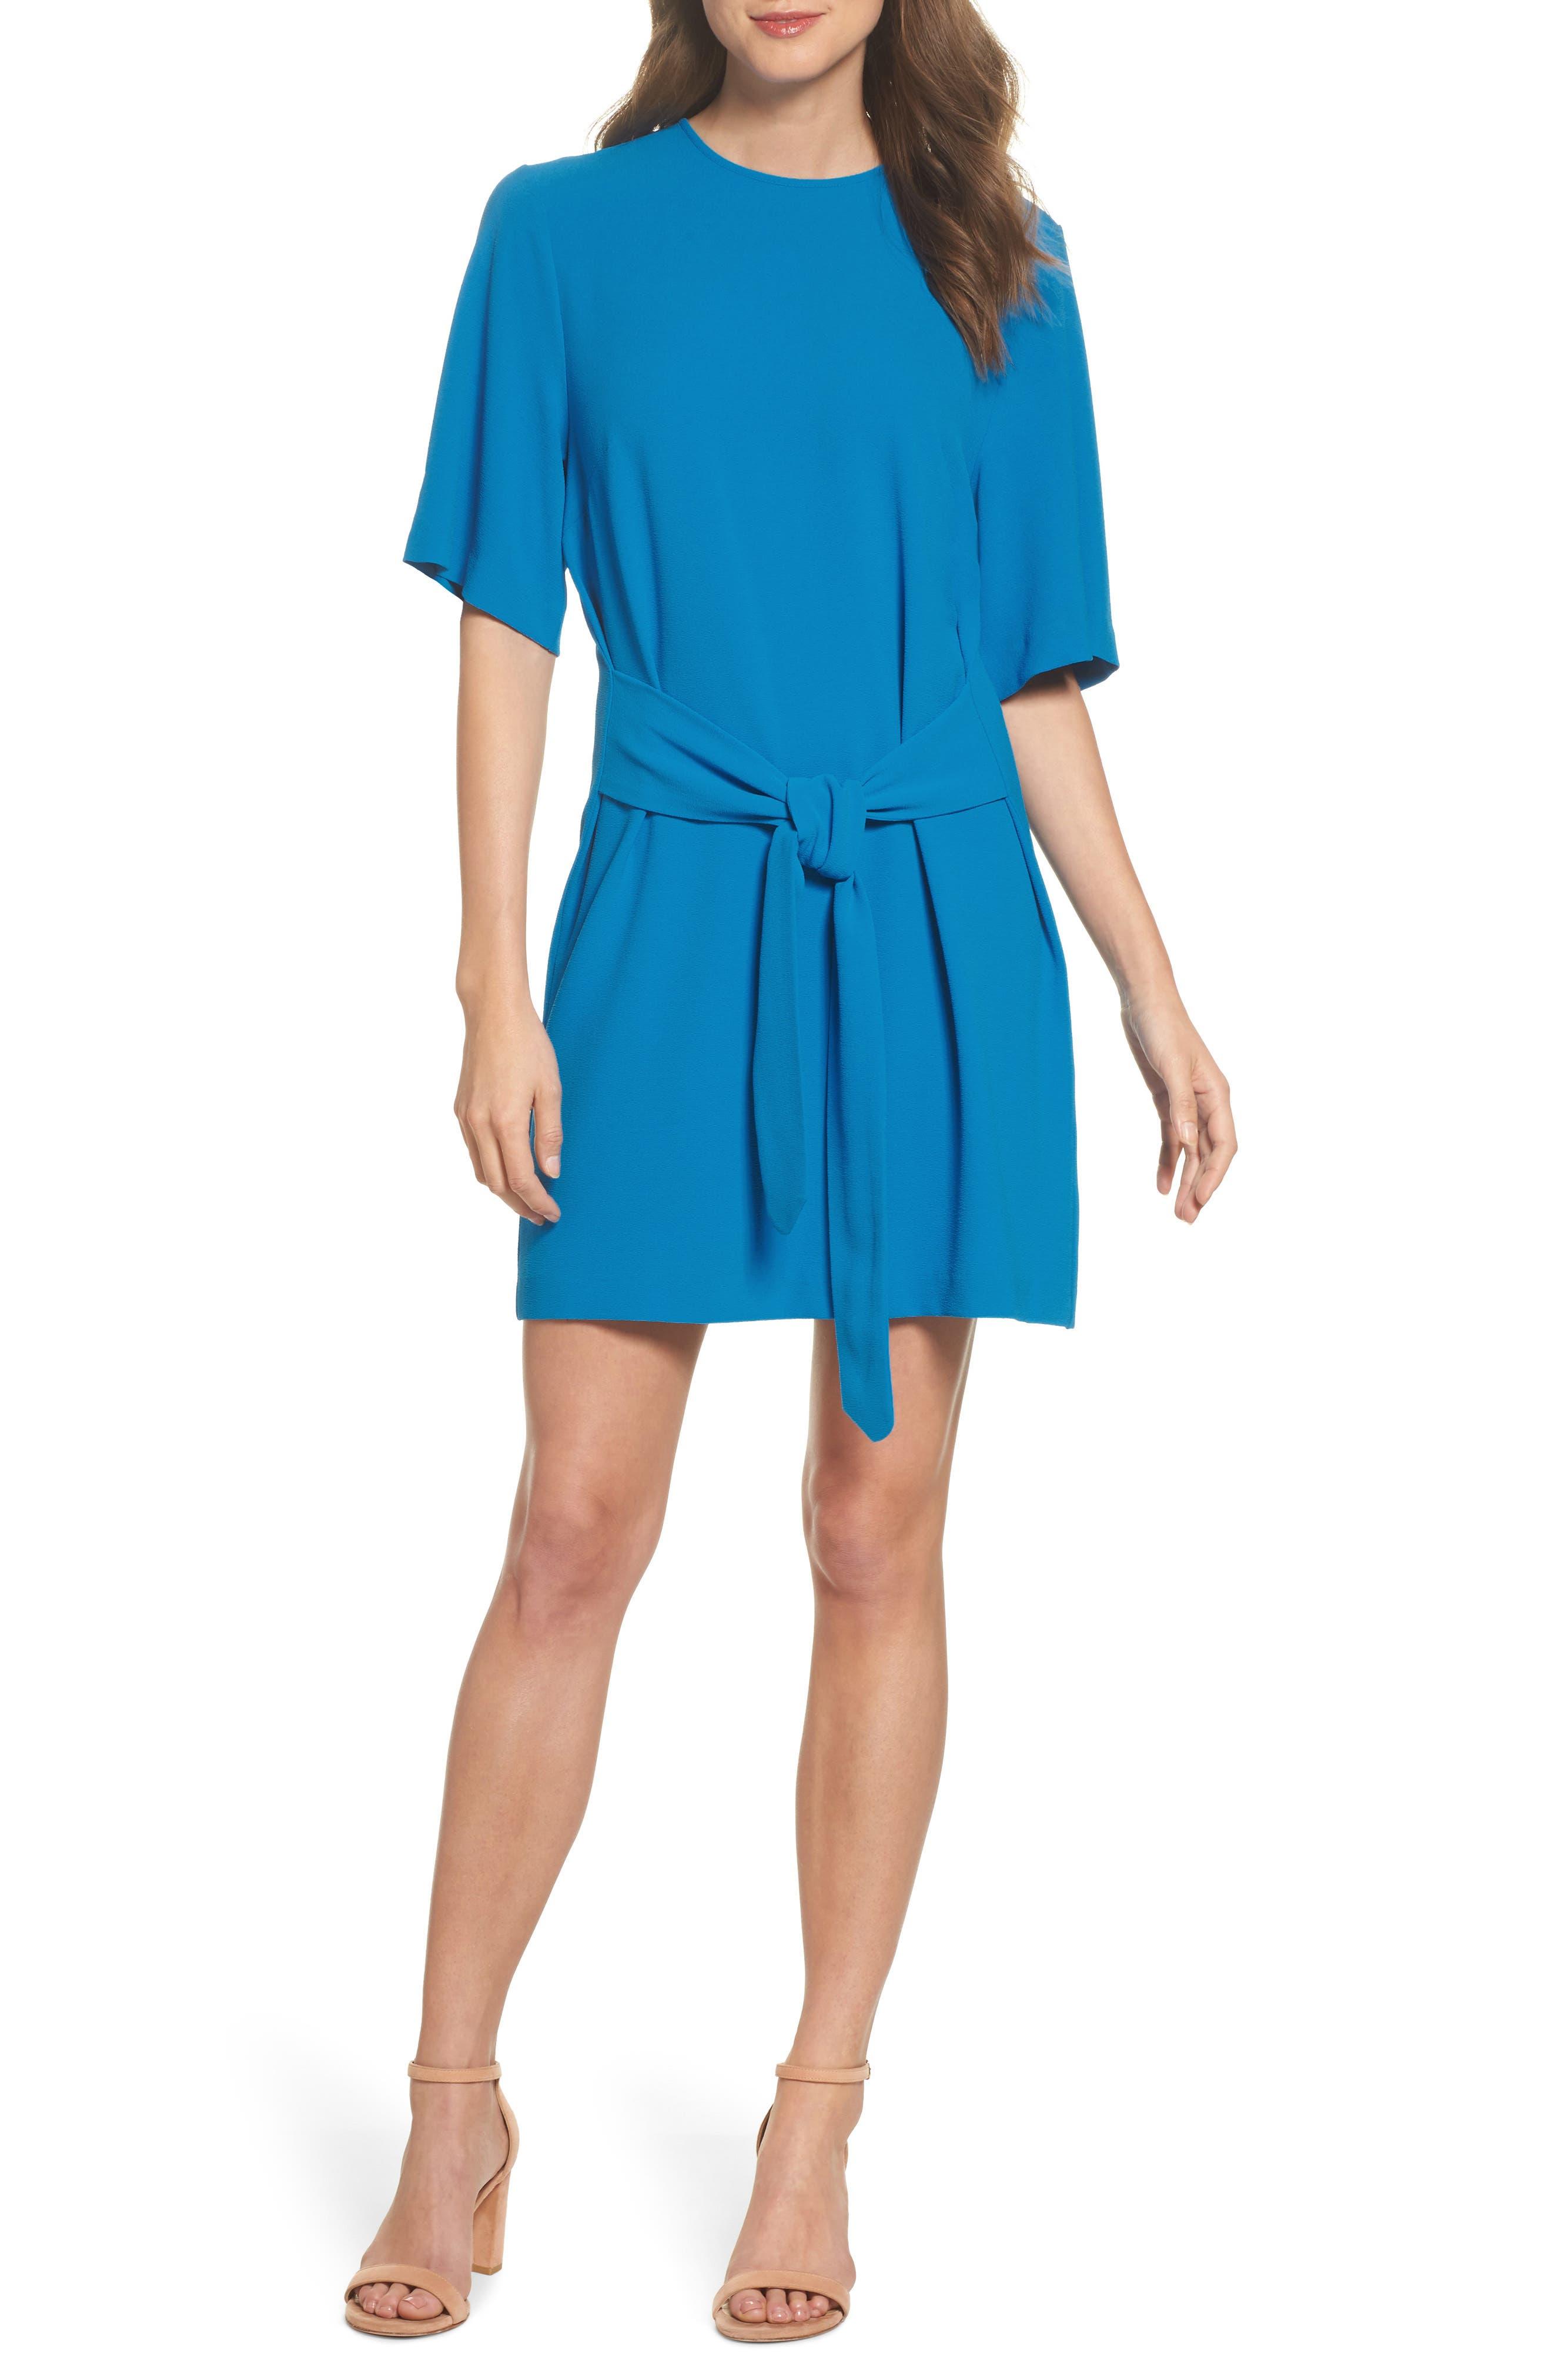 Green Elbow Length Dress